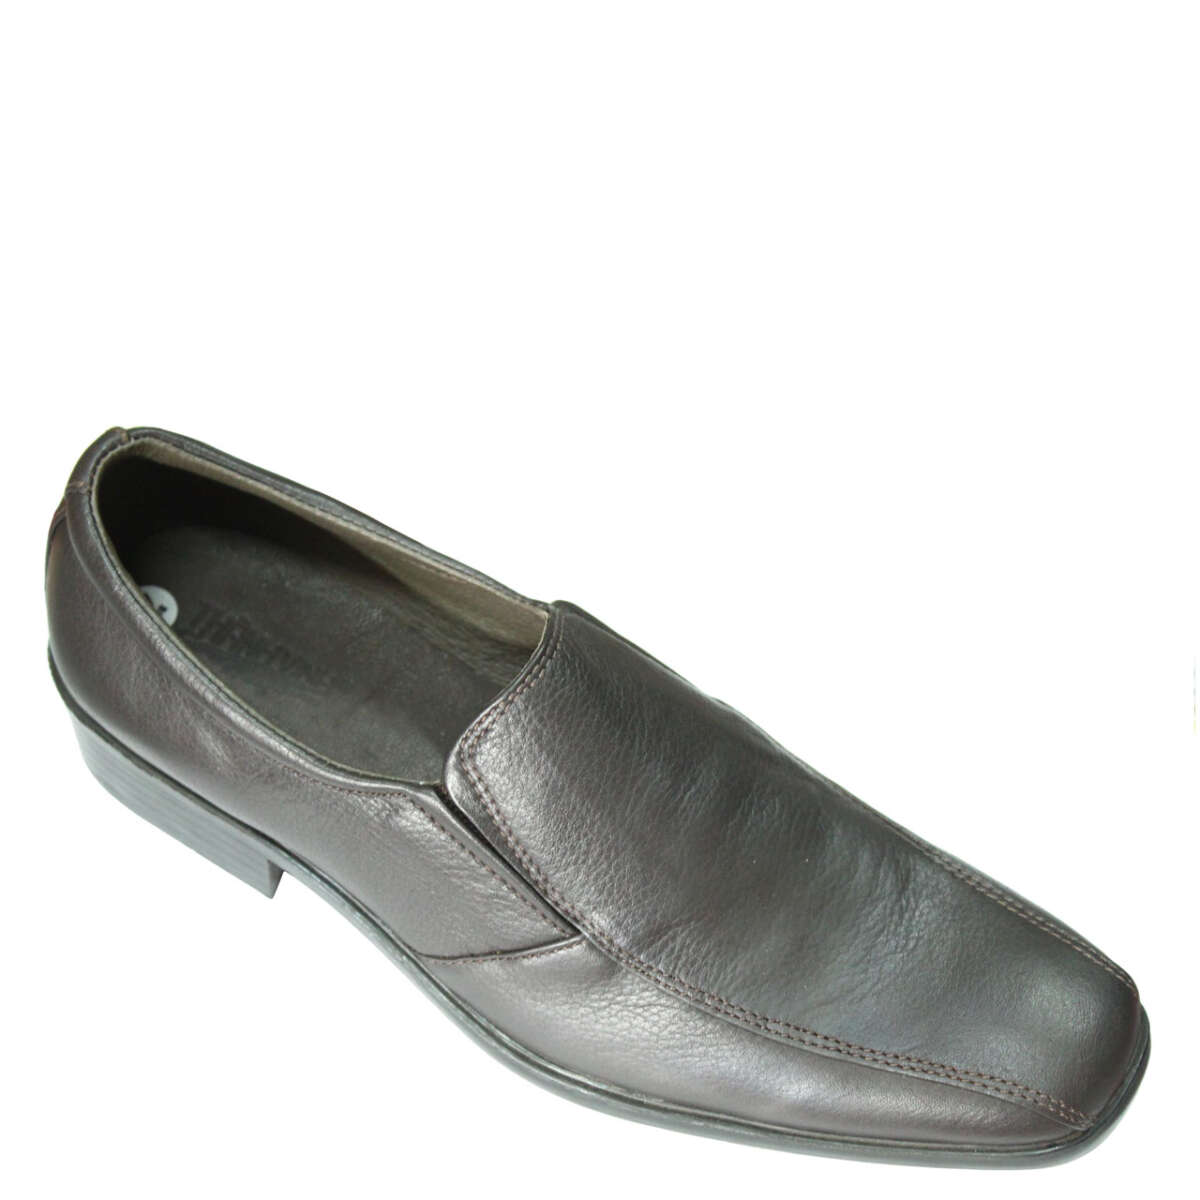 Giày nam da bò B851a